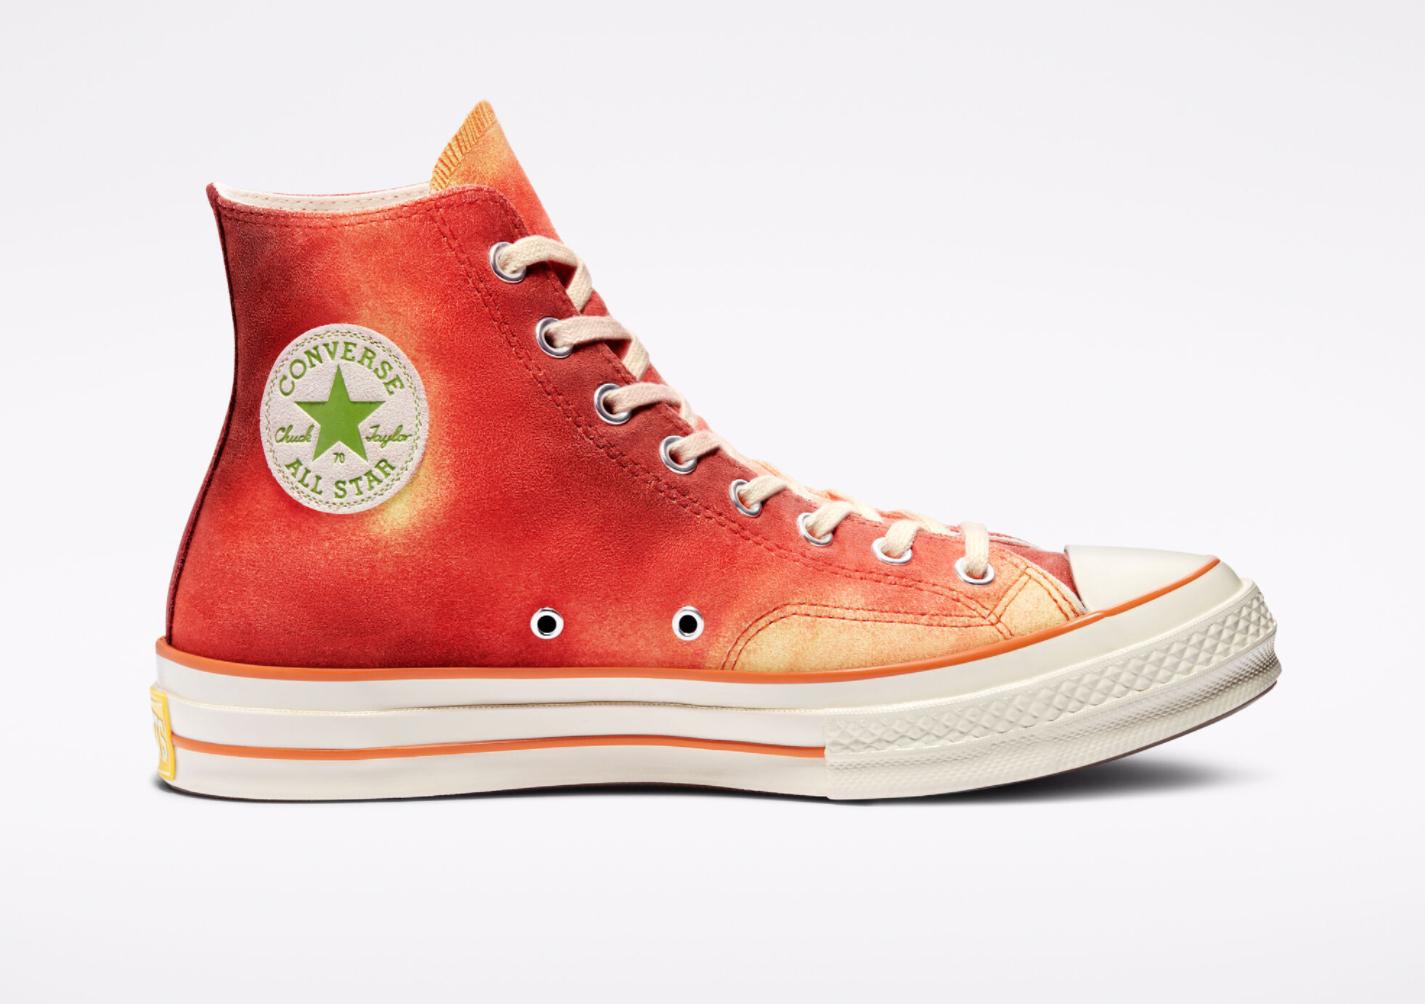 Paire de chaussures Converse Chuck 70 x Concepts Southern Flame Chuck montante